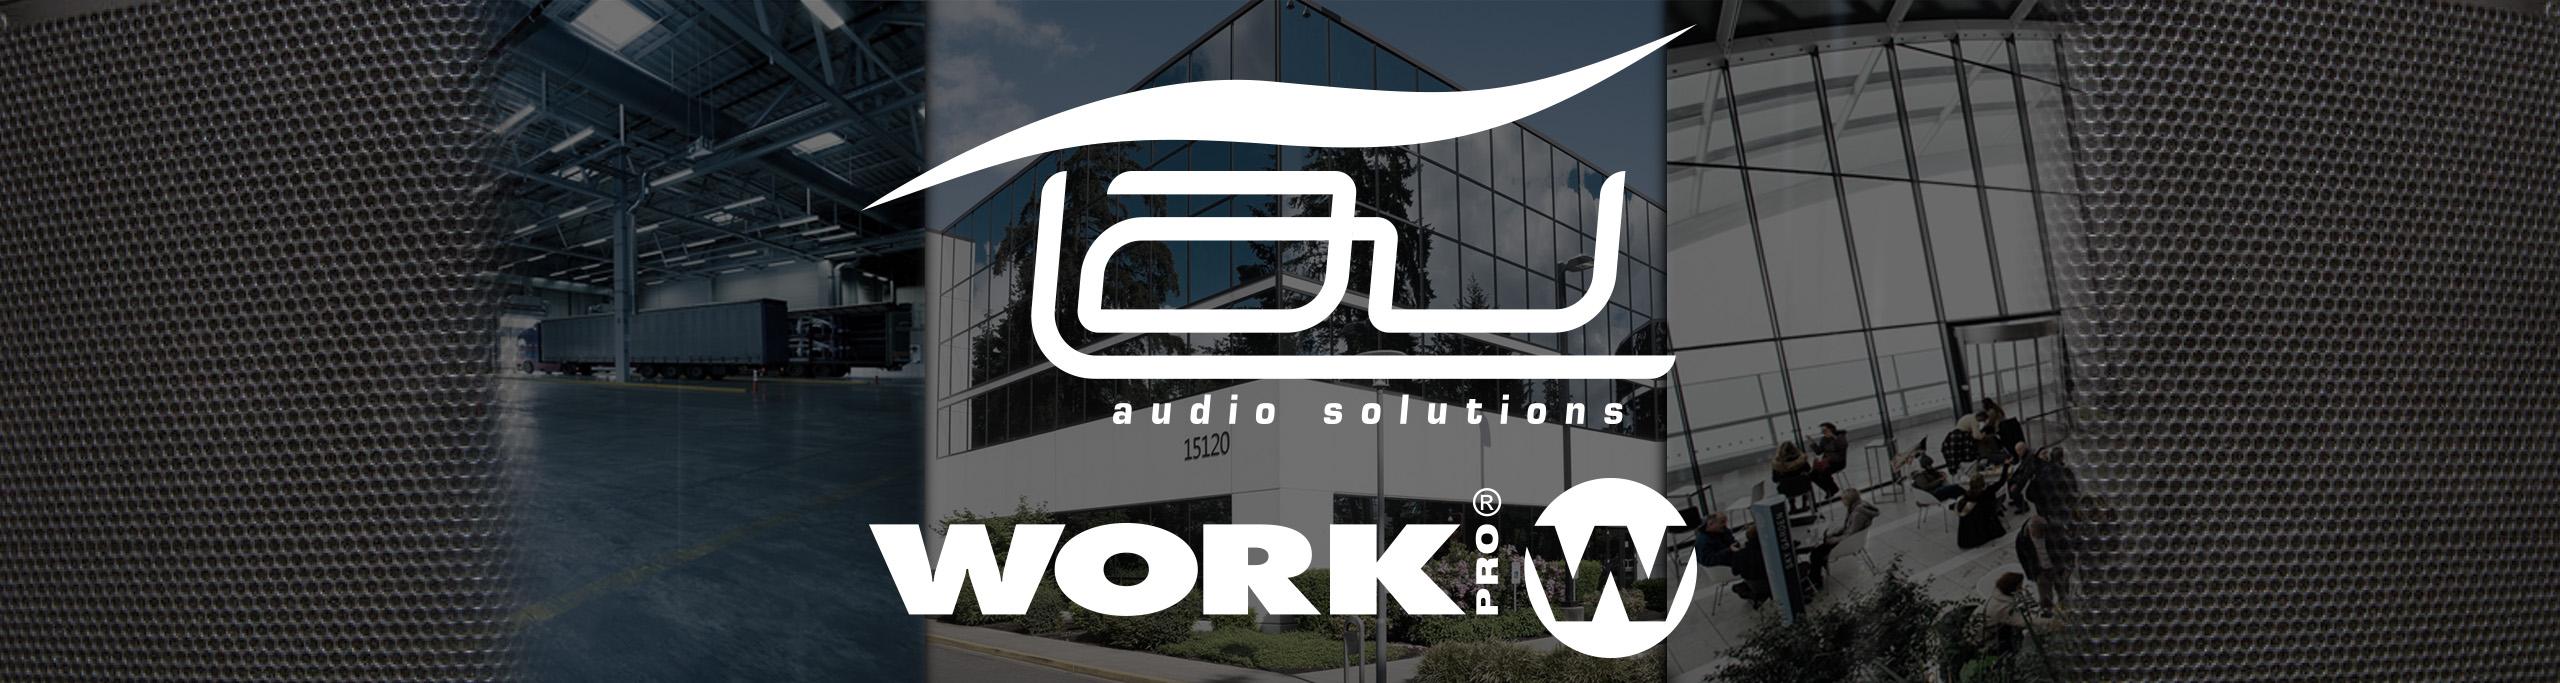 Tau distributeur Work Pro